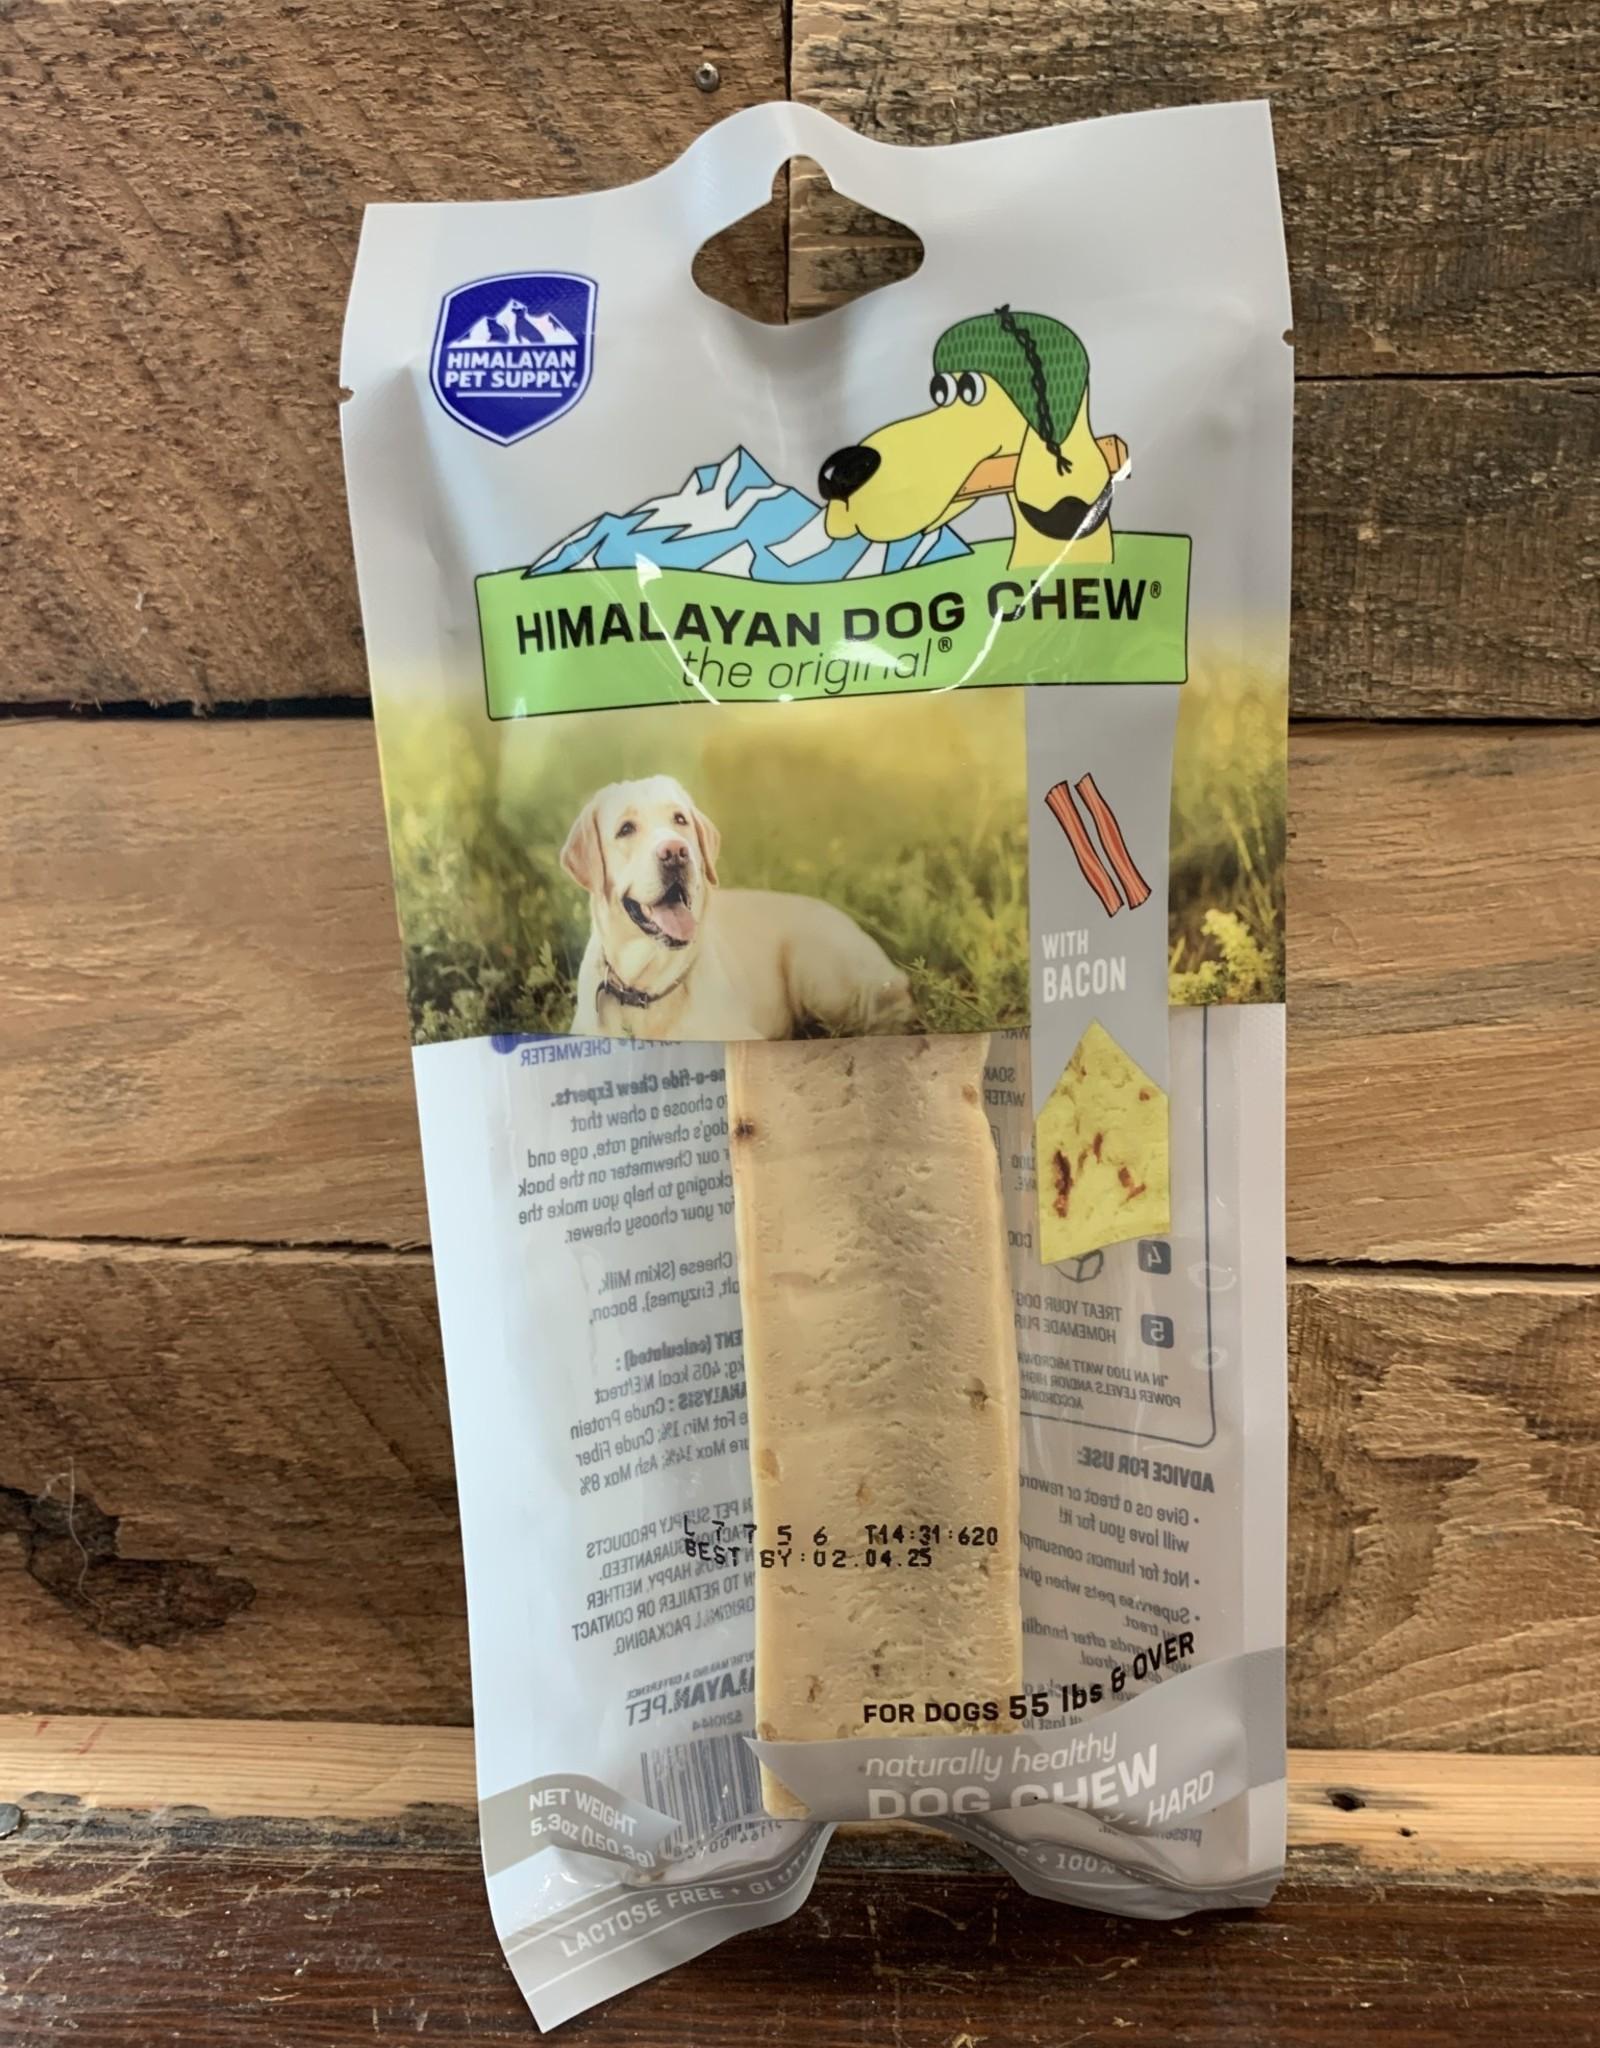 Himalayan Dog Chew Himalayan Dog Bacon Chew XLG 5.3OZ